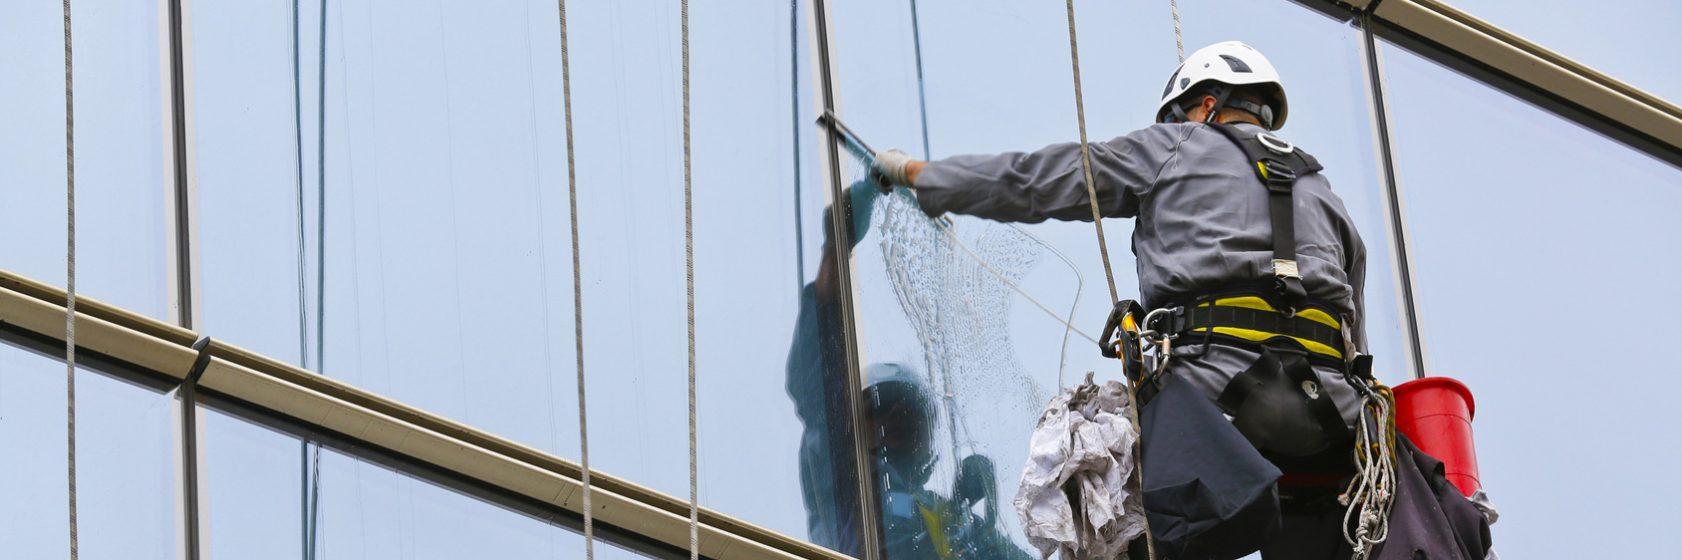 Nettoyage-Nettoyage-de-vitrerie-inaccessible-4